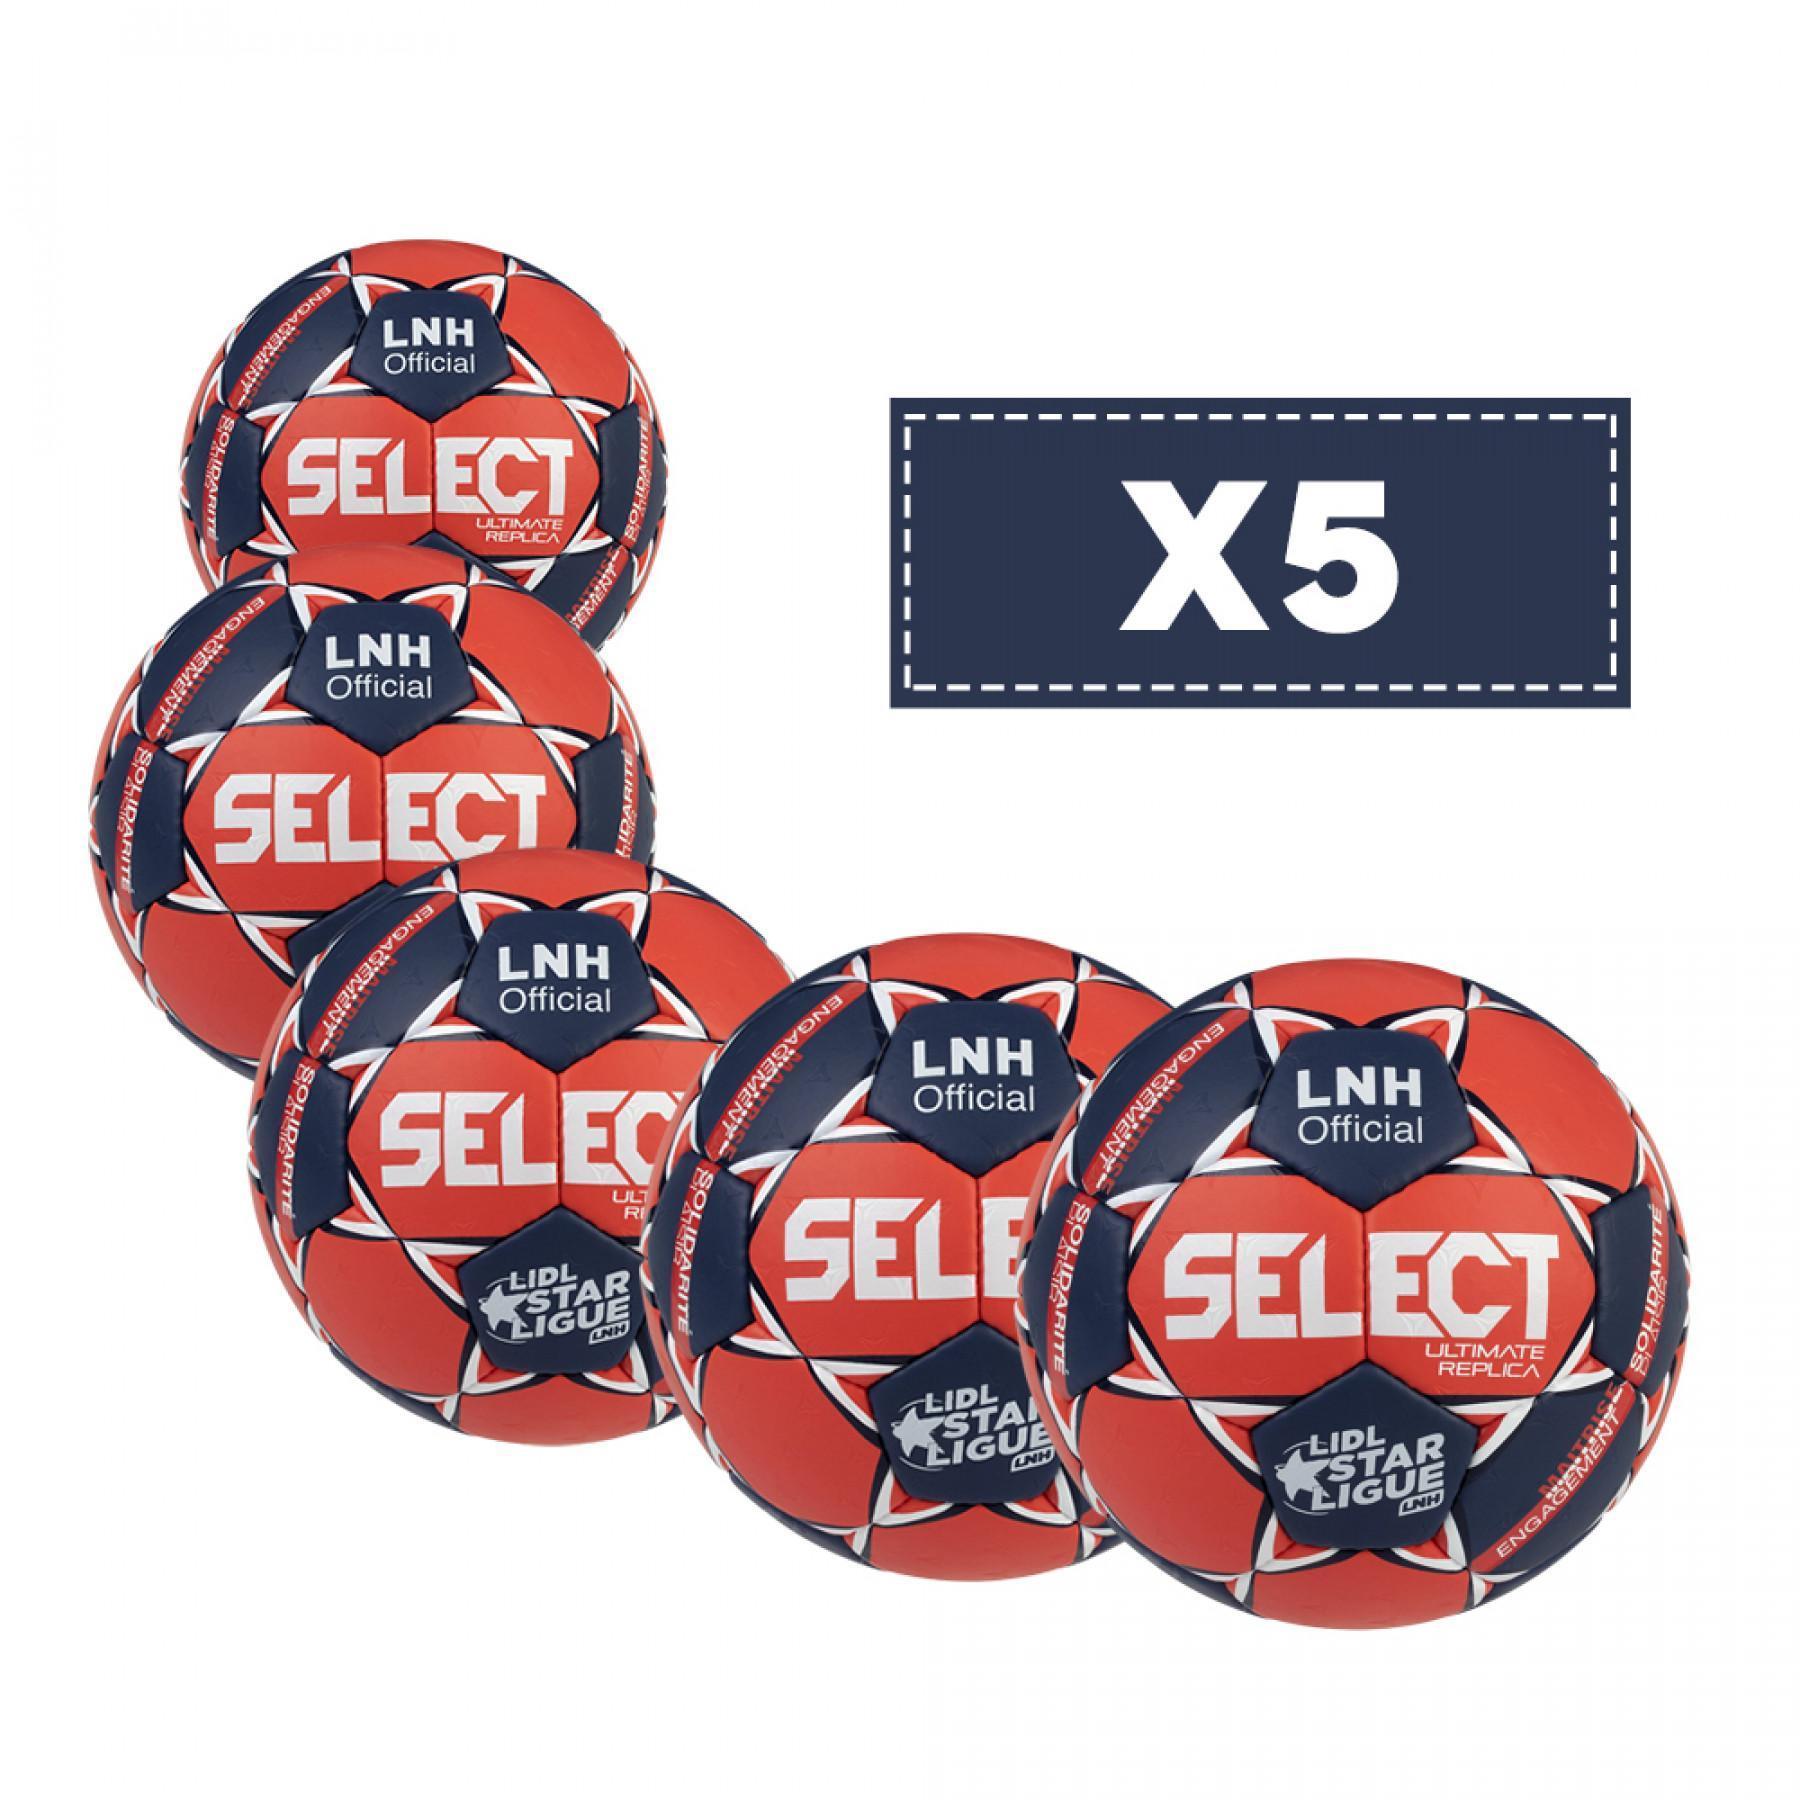 Set of 5 balloons Select Ultimate LNH Replica 2020/21